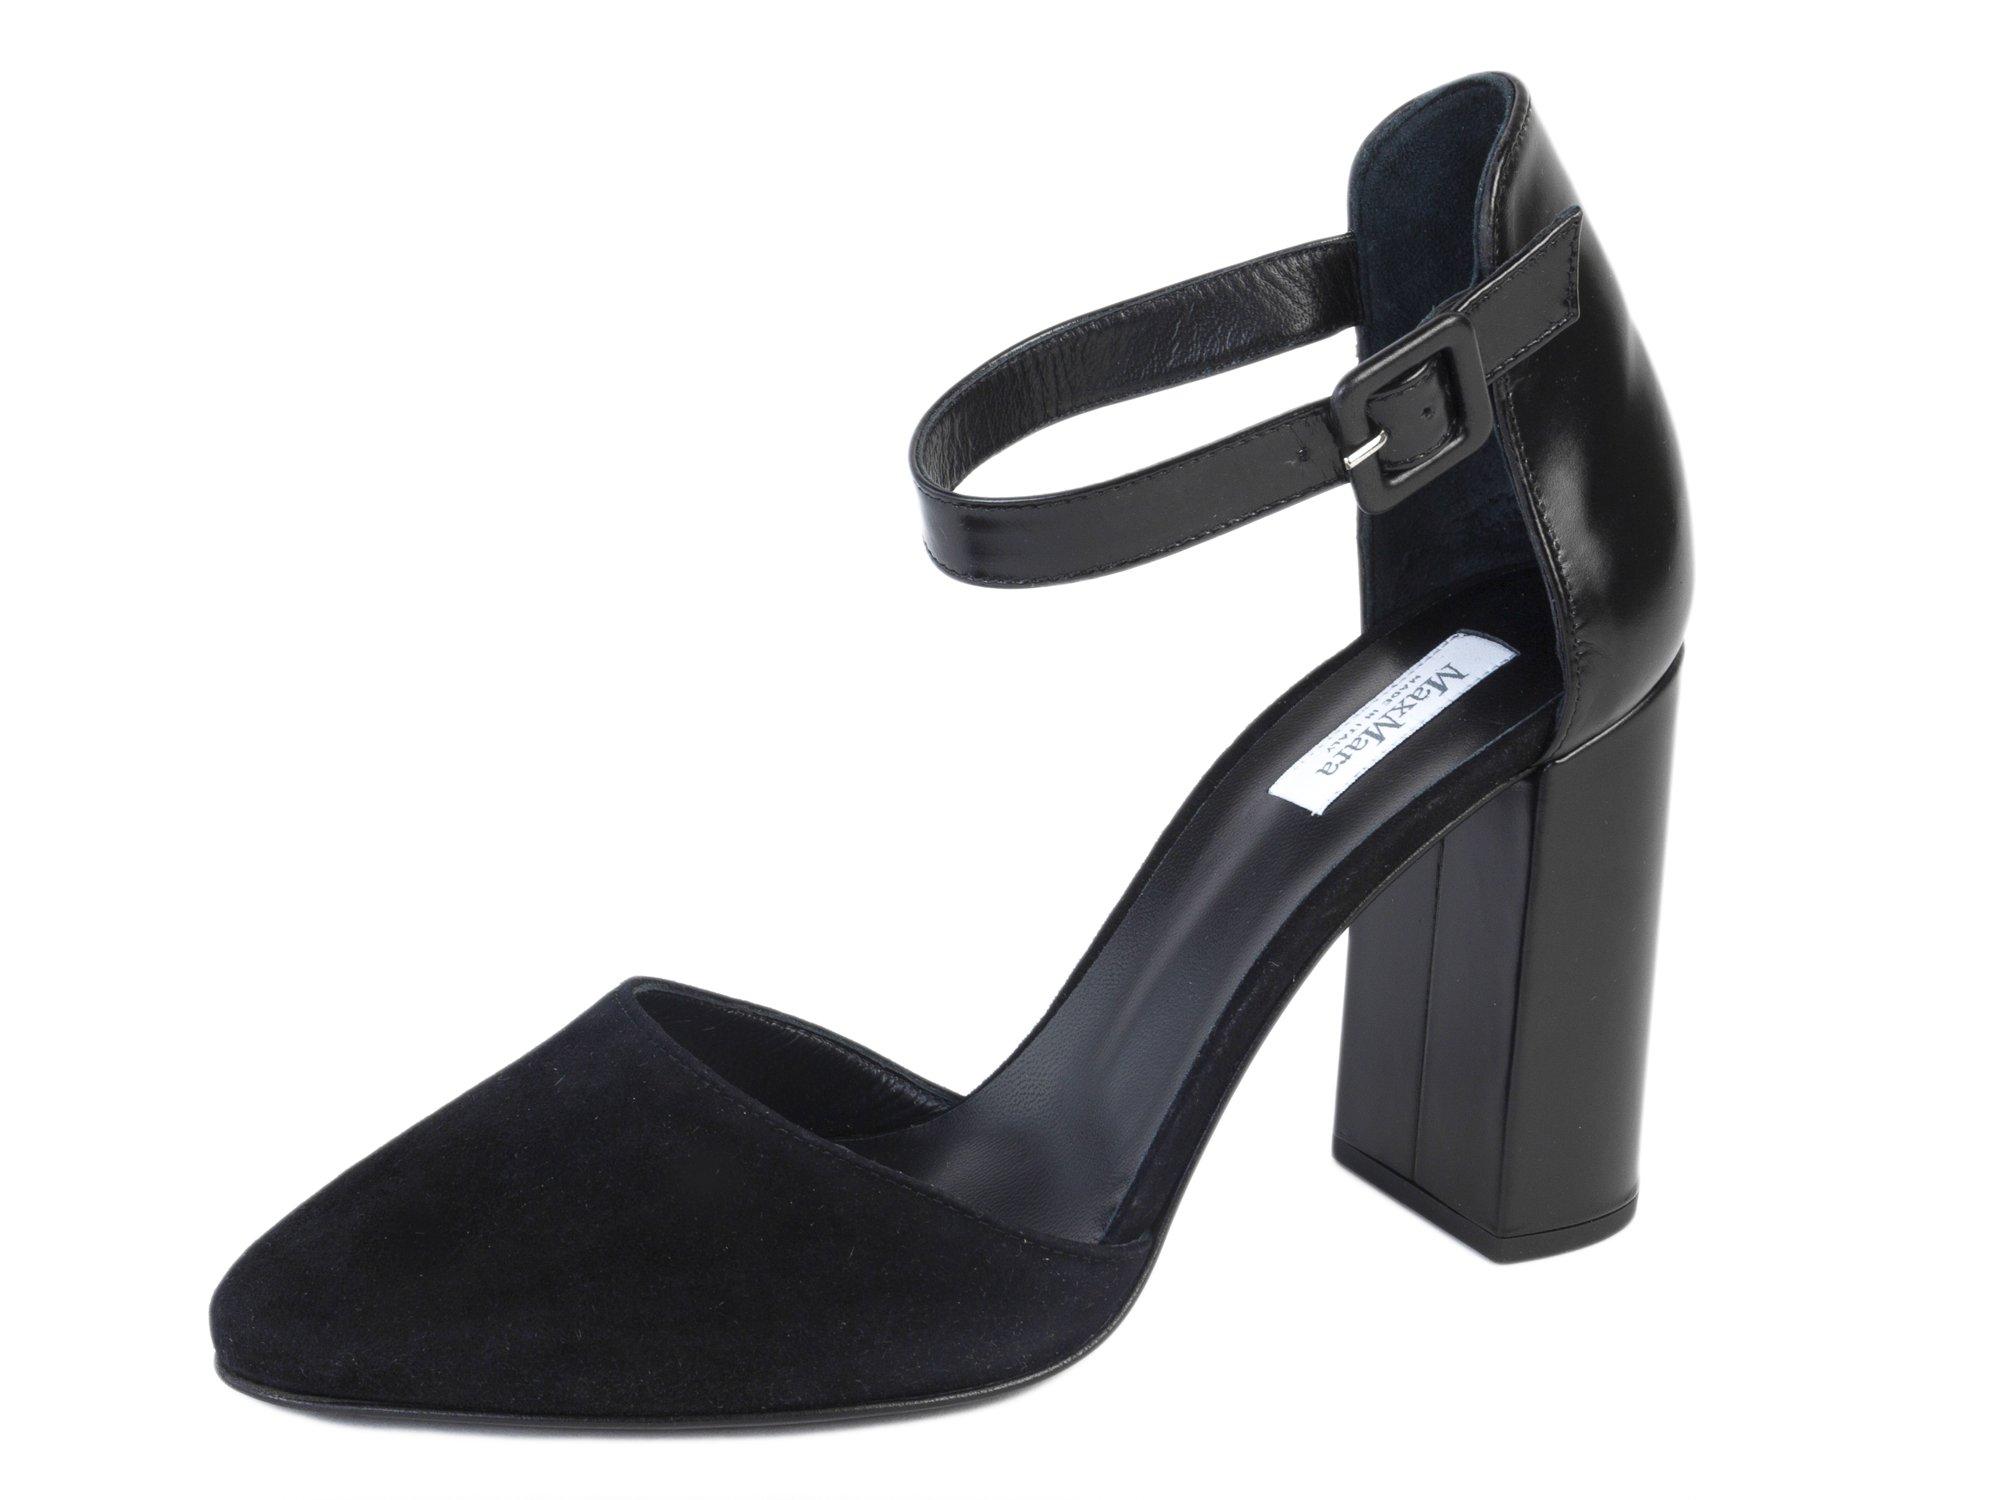 MaxMara Women's Gong Leather Ankle Strap Pumps US 7/IT 37 Black